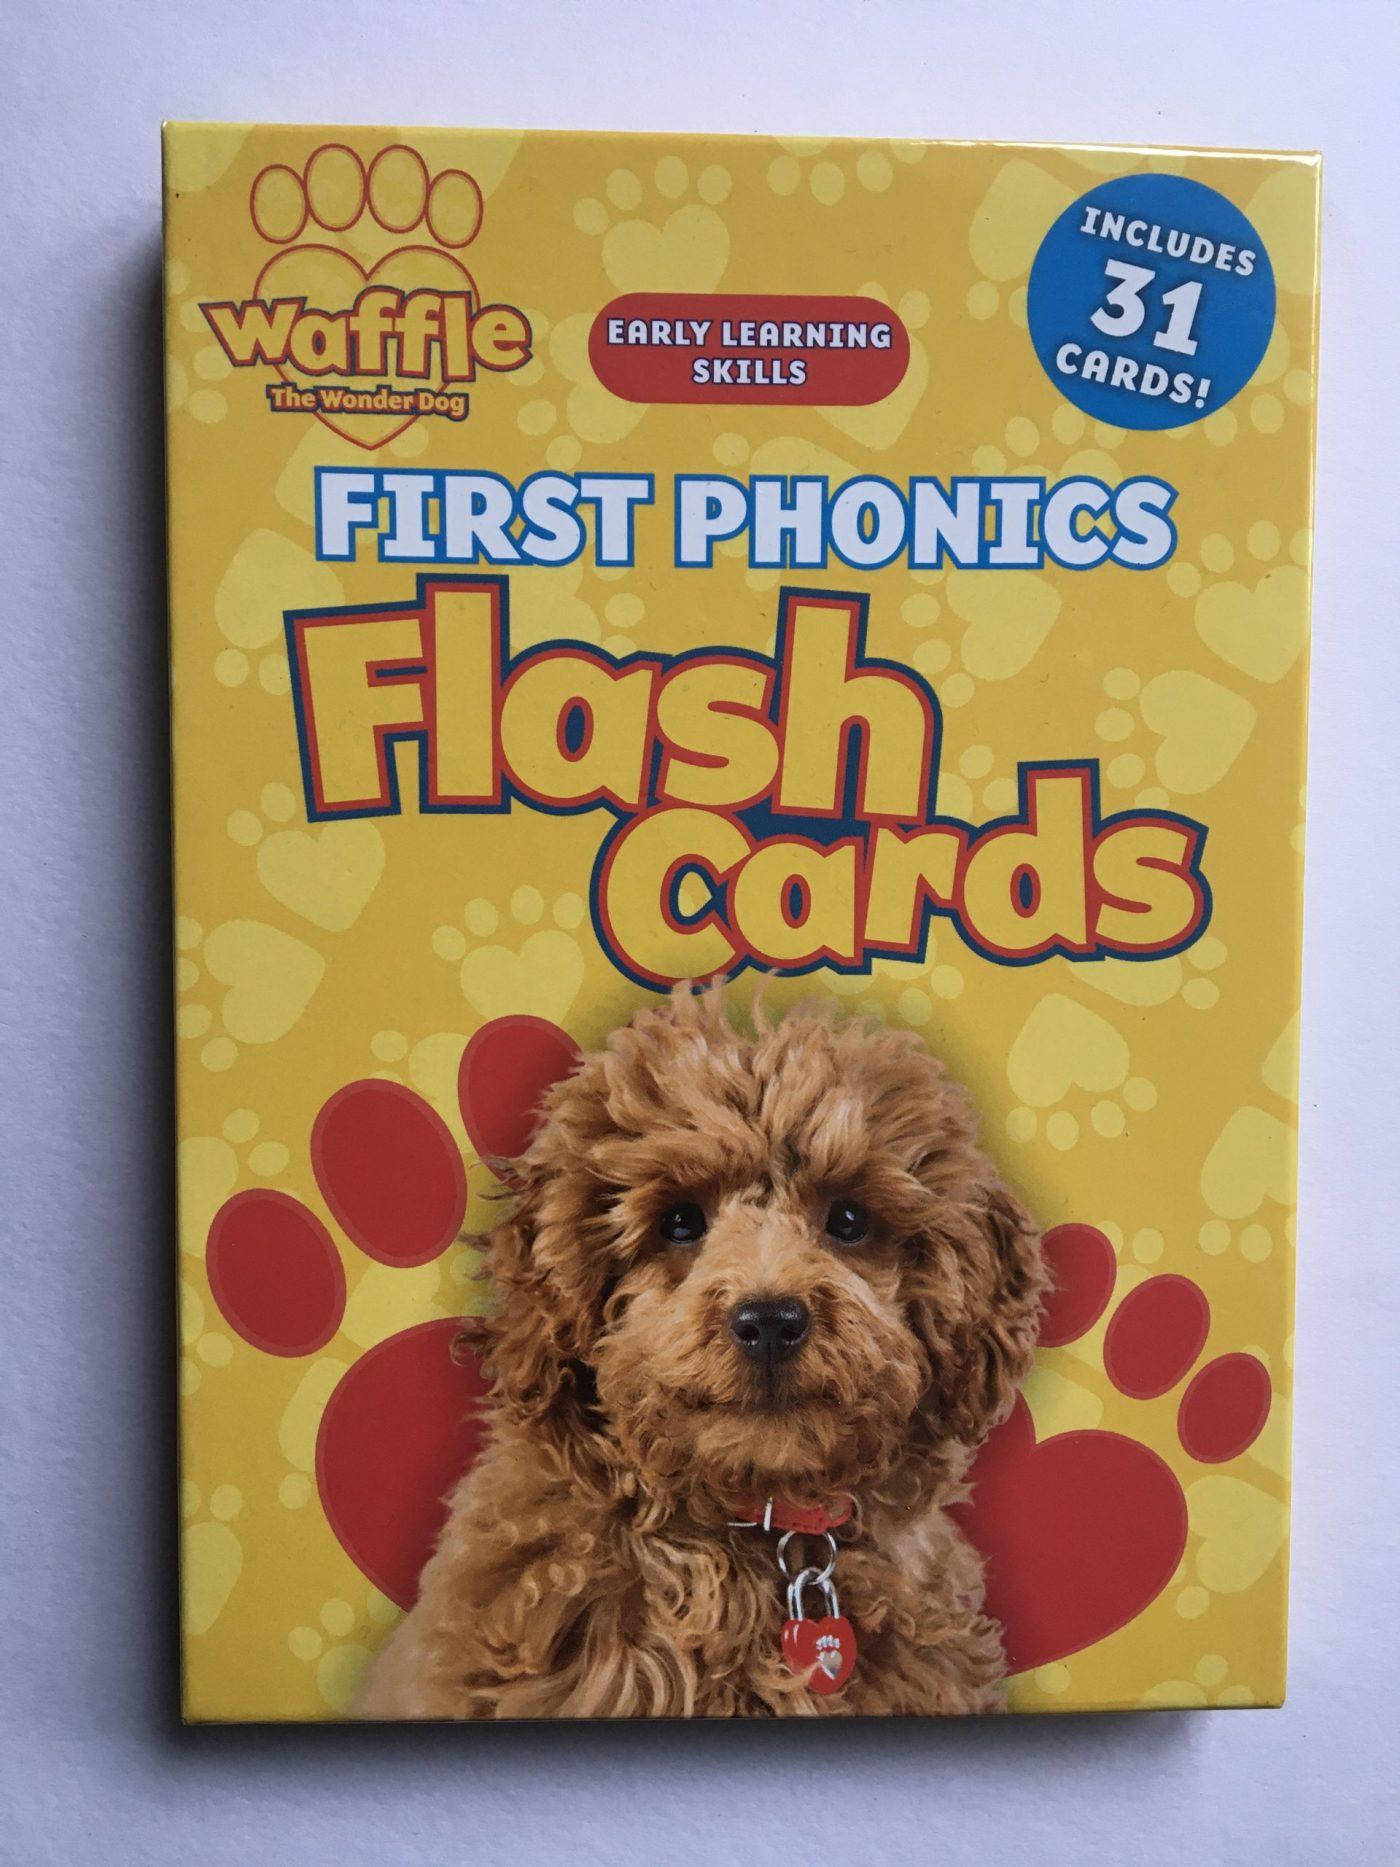 Waffle the Wonder Dog first phonics flash cards